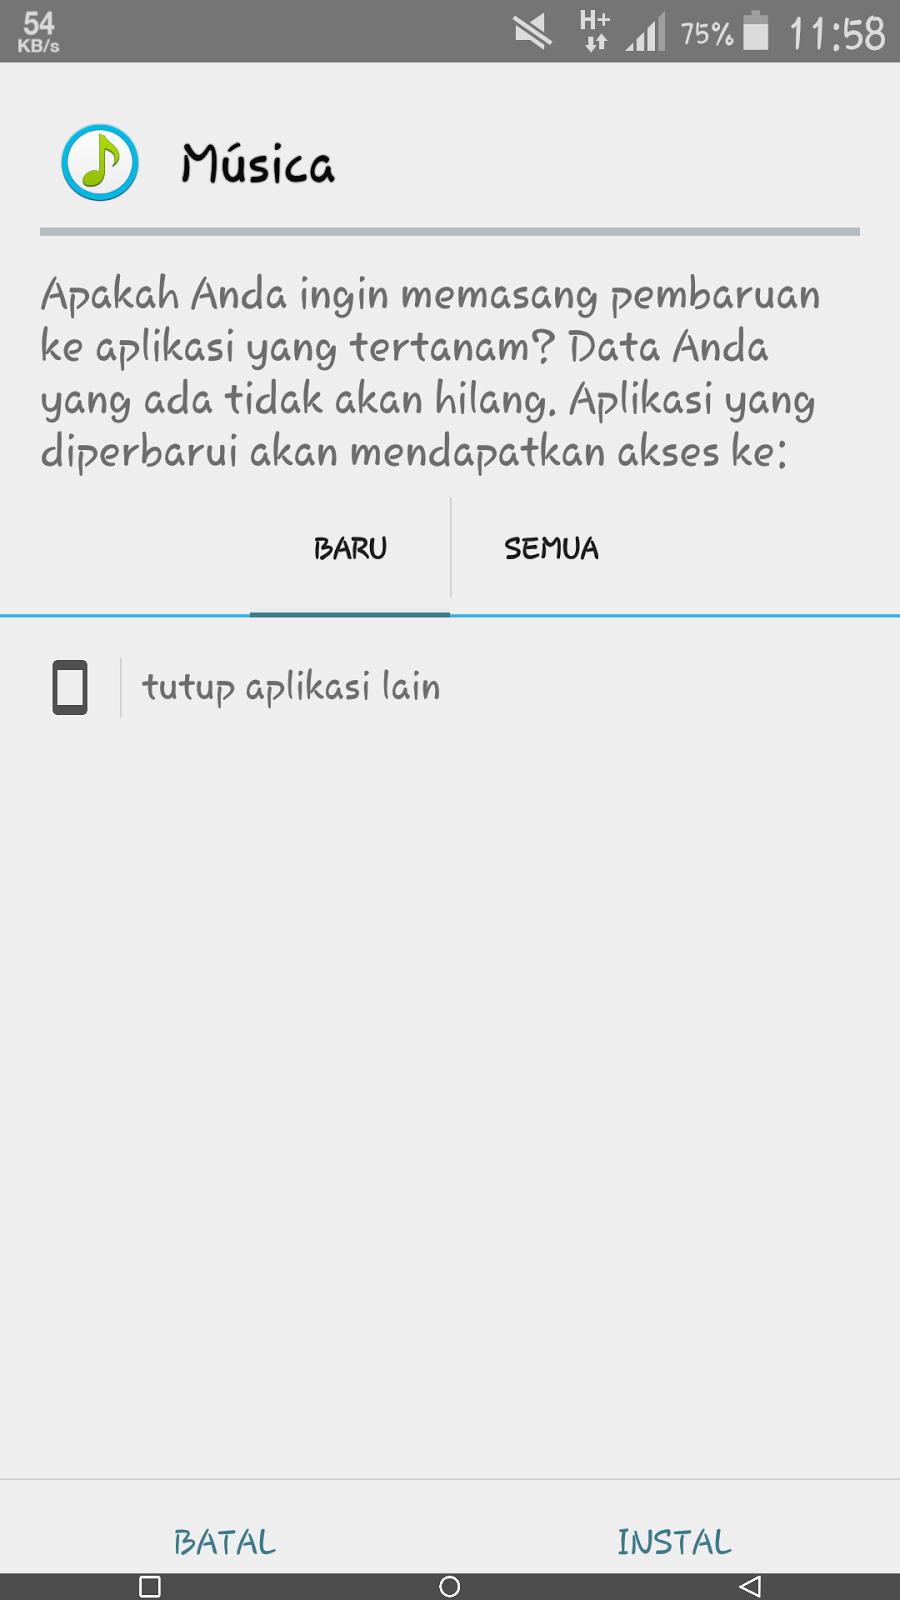 Samsung Music Untuk Android 4 4 kitkat dan Samsung Music